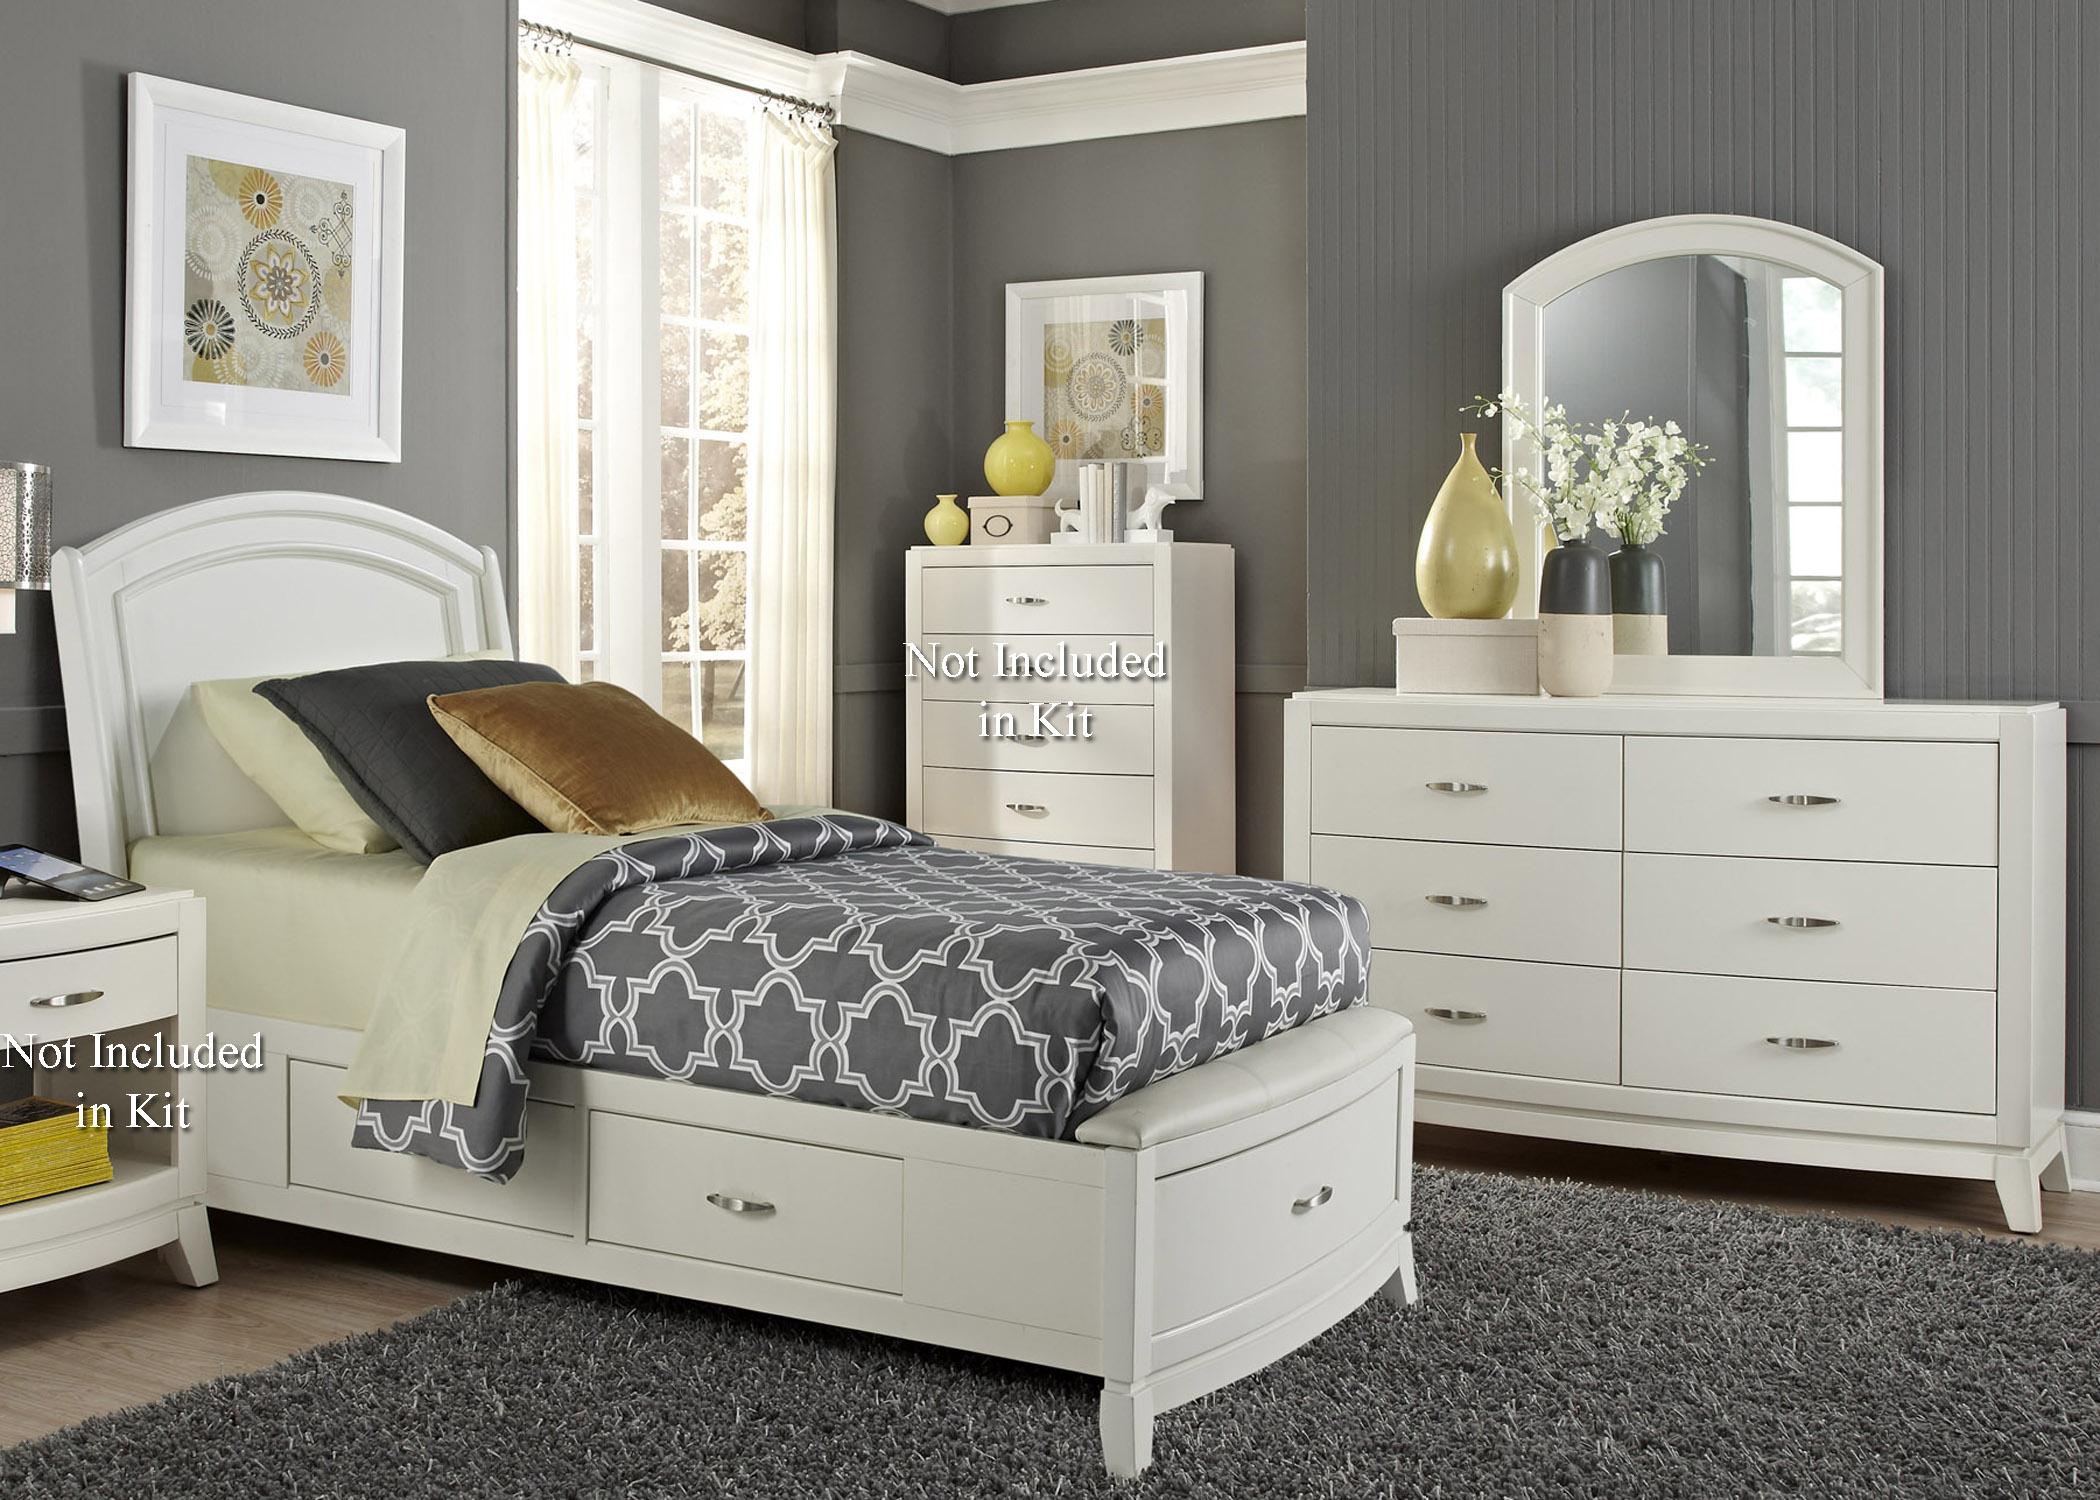 Liberty Furniture Avalon II Full Storage Bedroom Group 1 - Item Number: 205-YBR-F1SDM